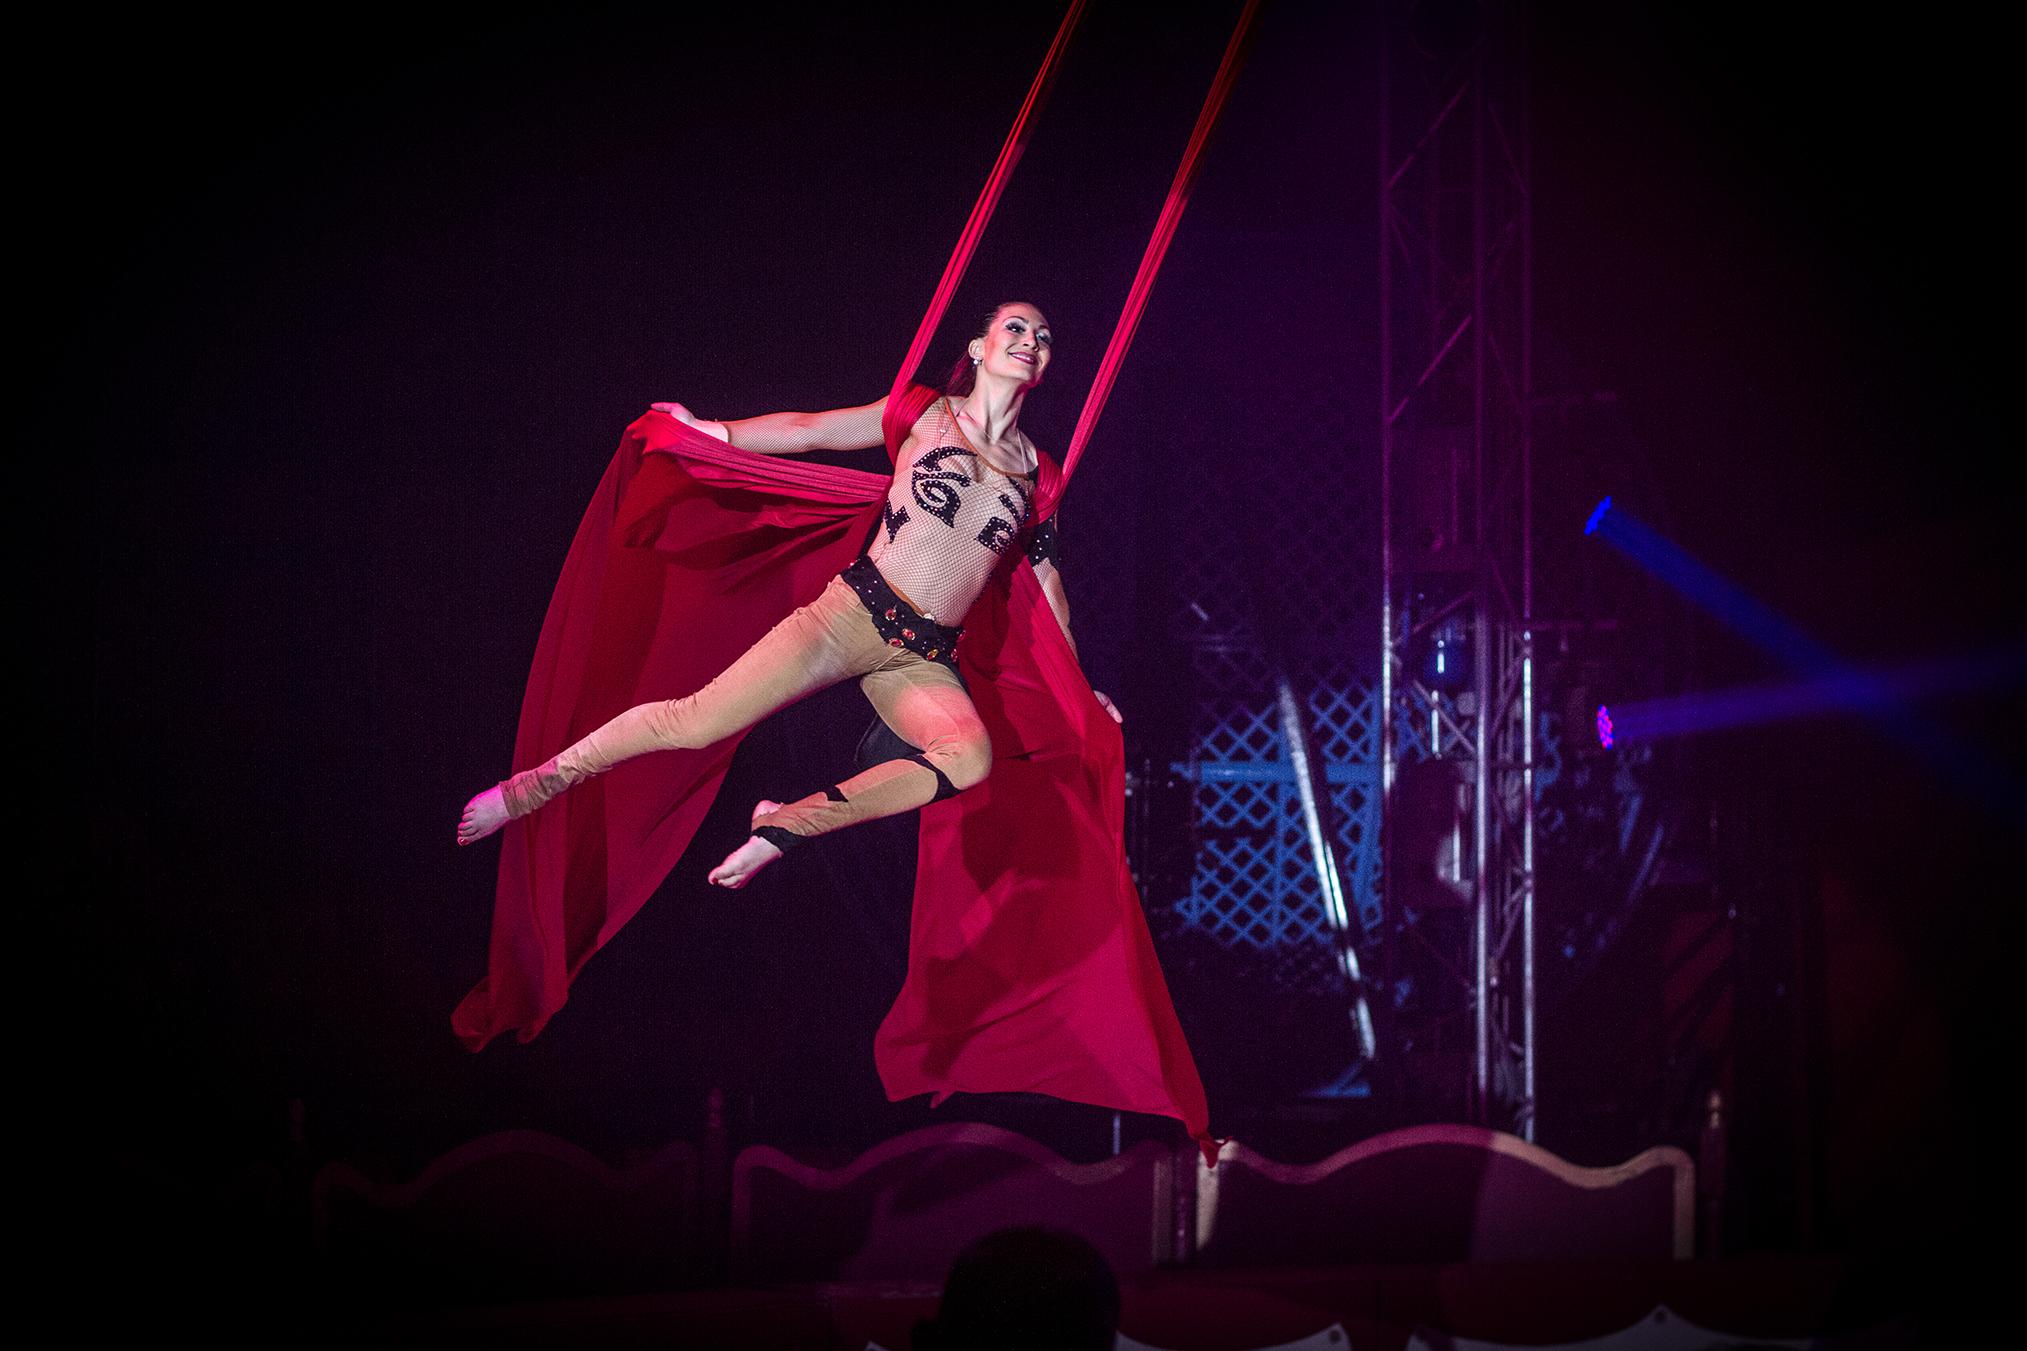 Curtain gymnastics